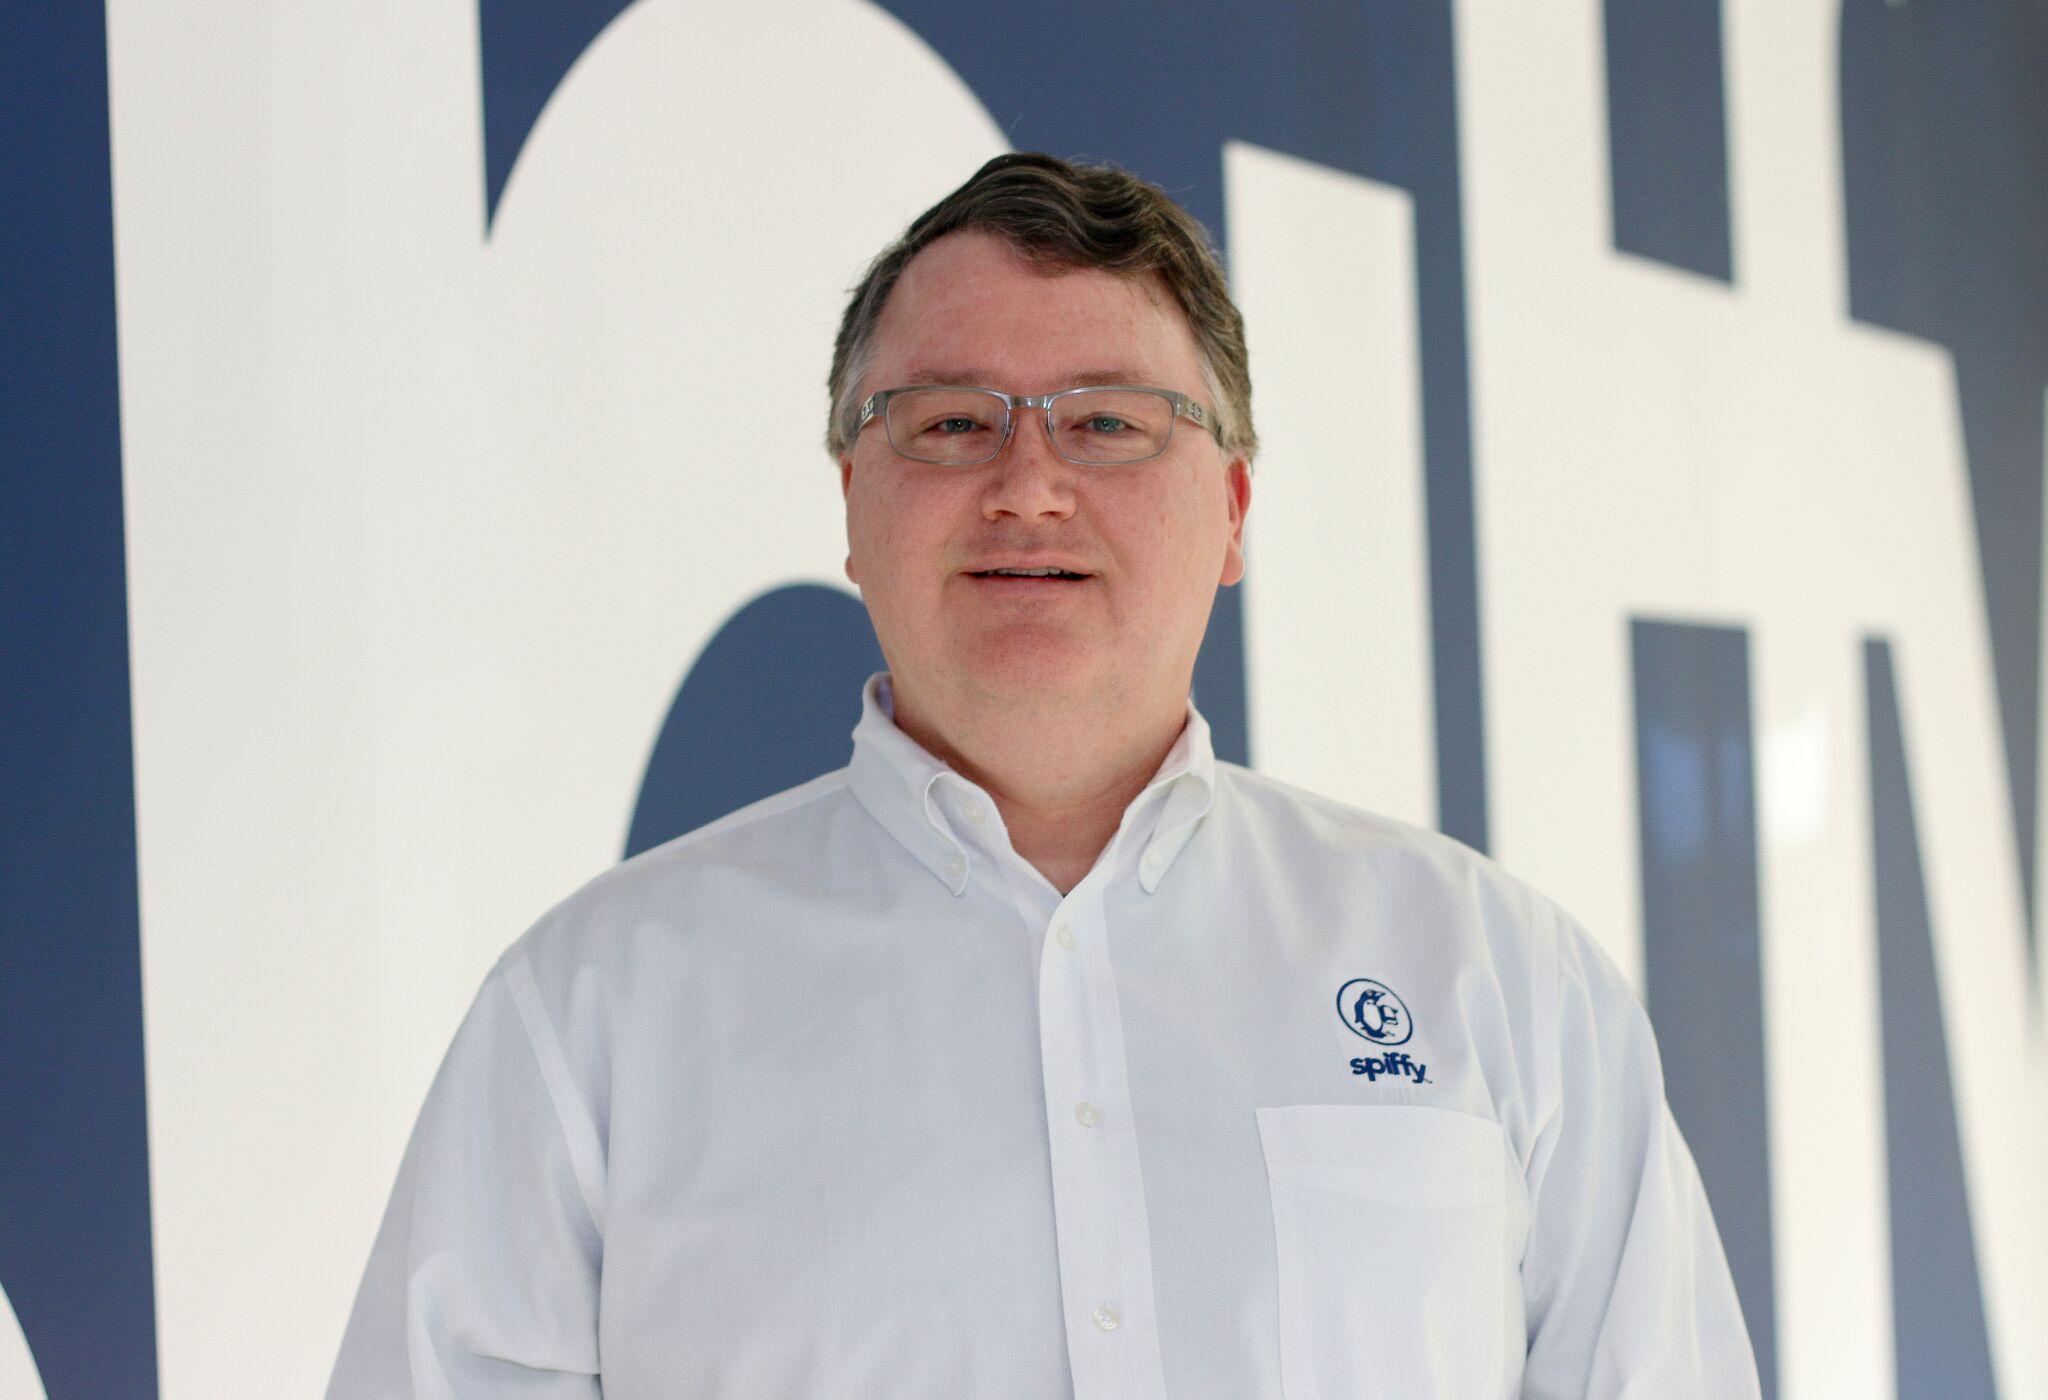 Scot Wingo CEO of Spiffy